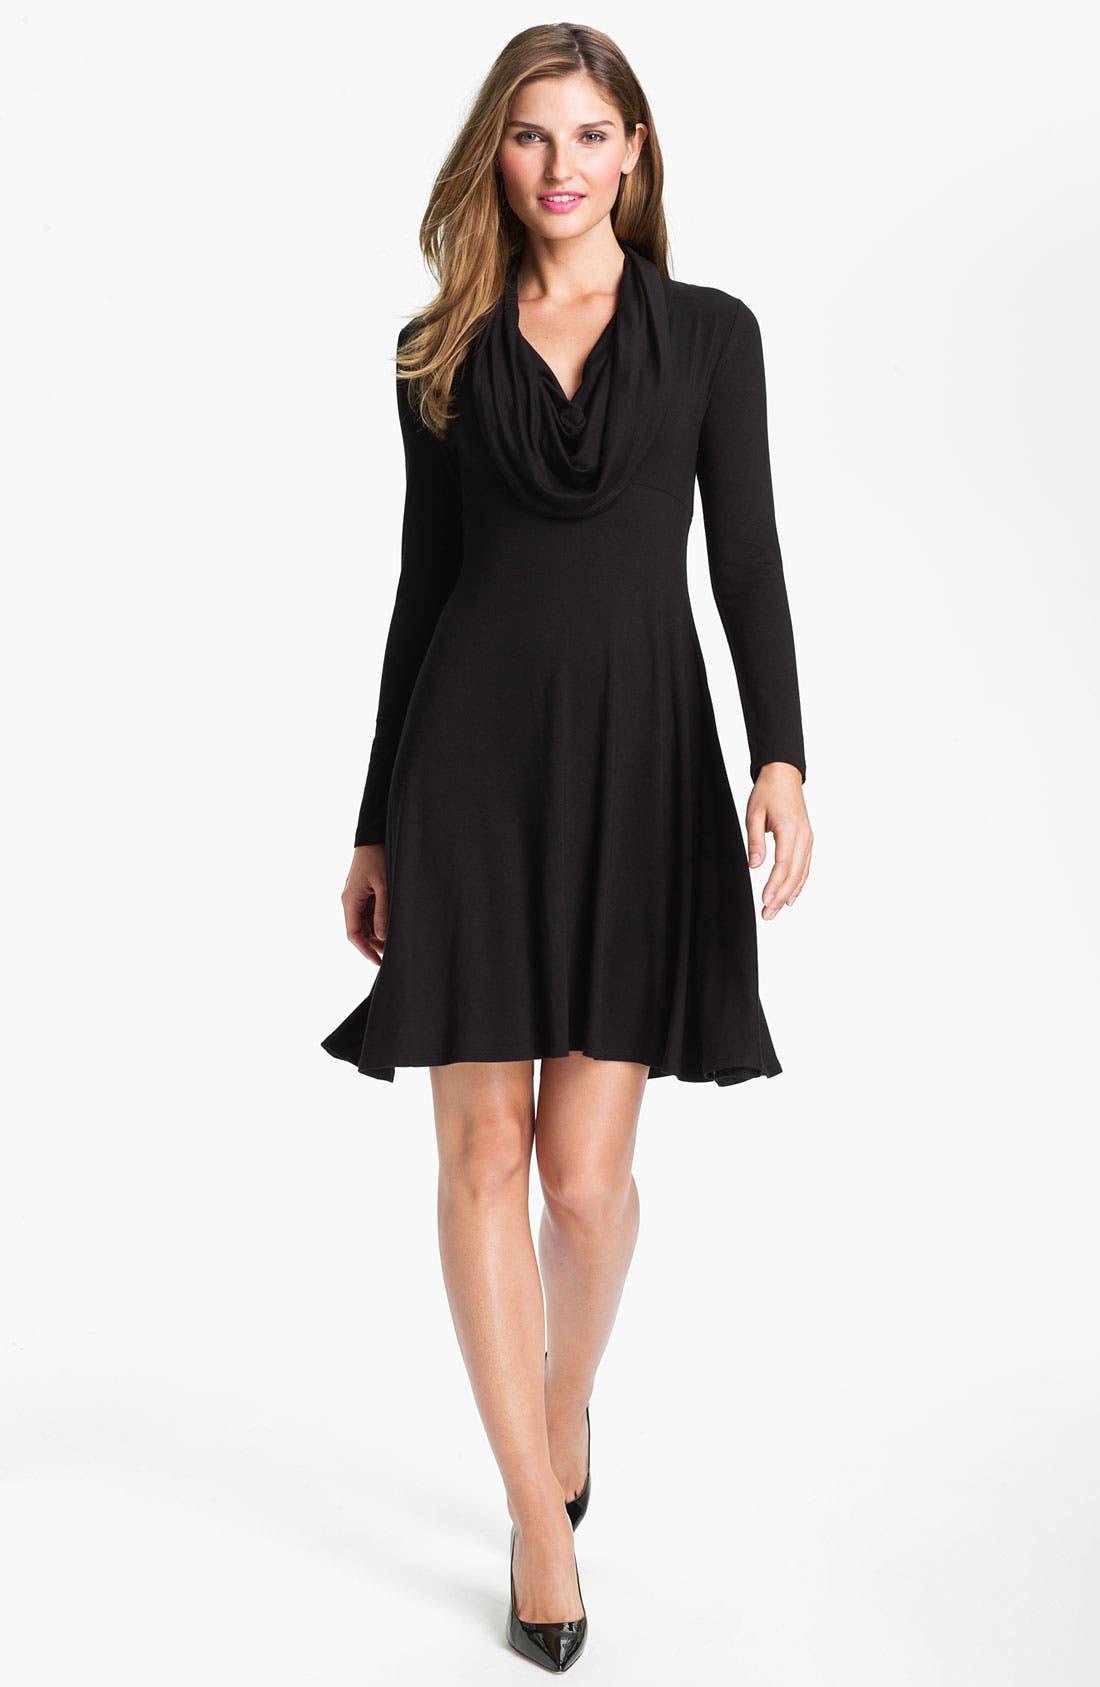 Alternate Image 1 Selected - Karen Kane Drape Neck Dress (Online Exclusive)